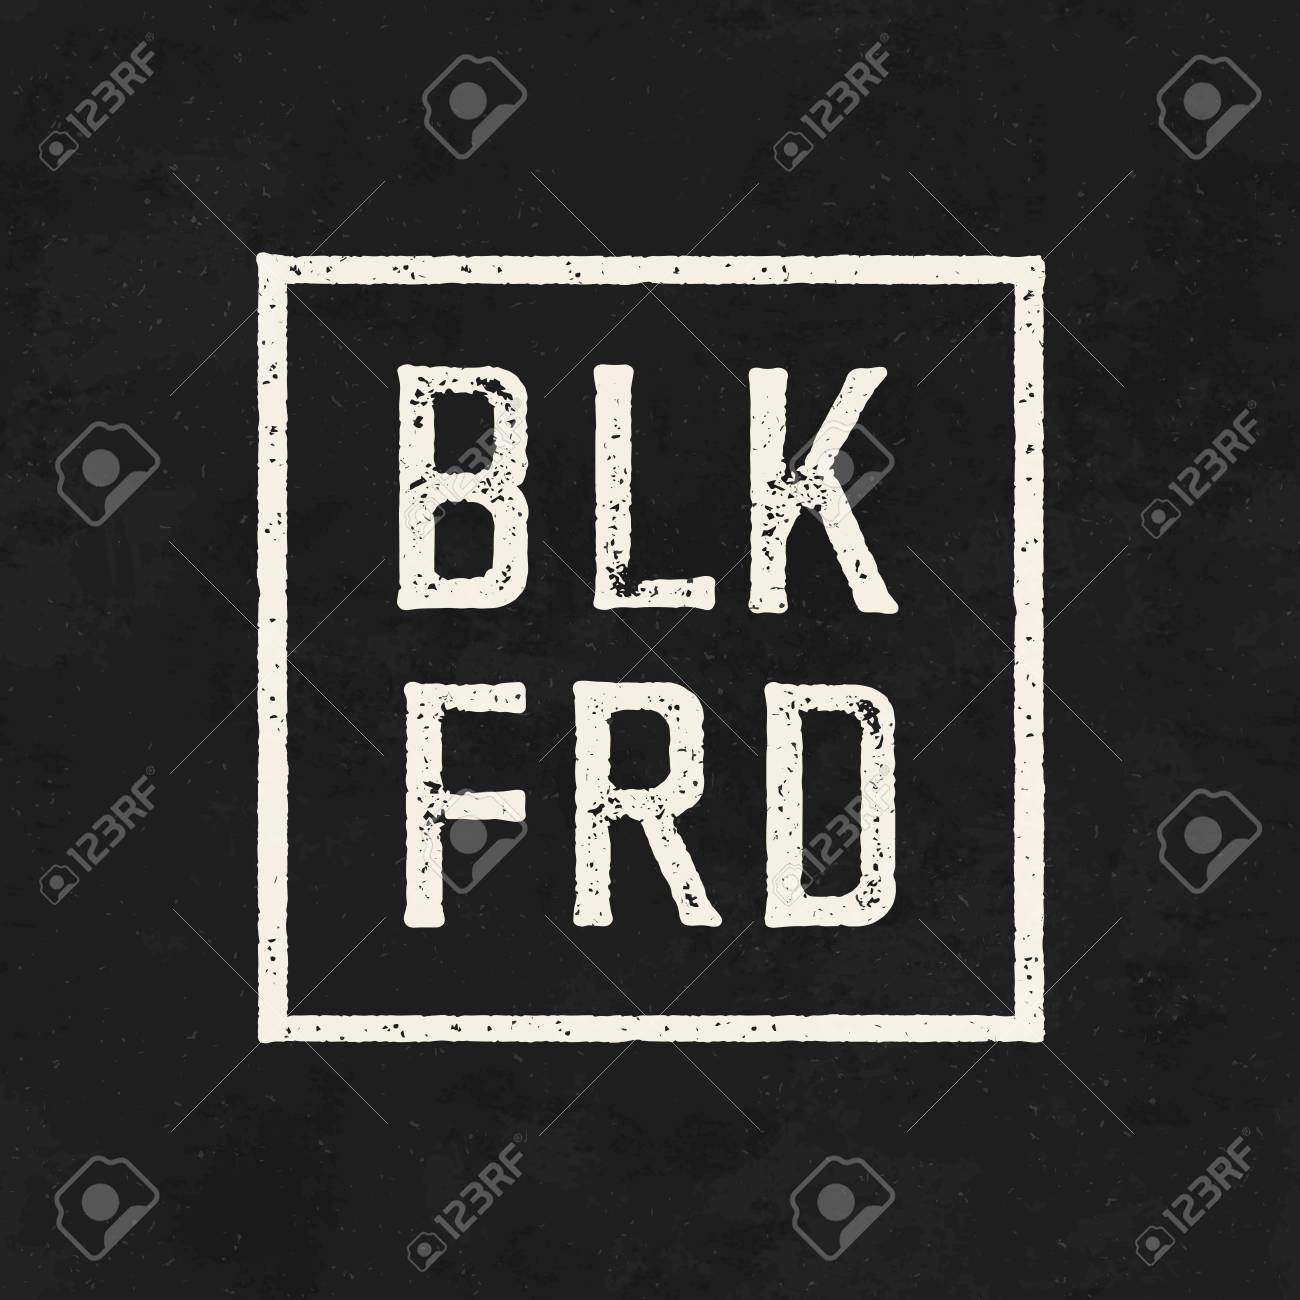 BLK FRD. Black friday sale on the blackboard background. - 65258852